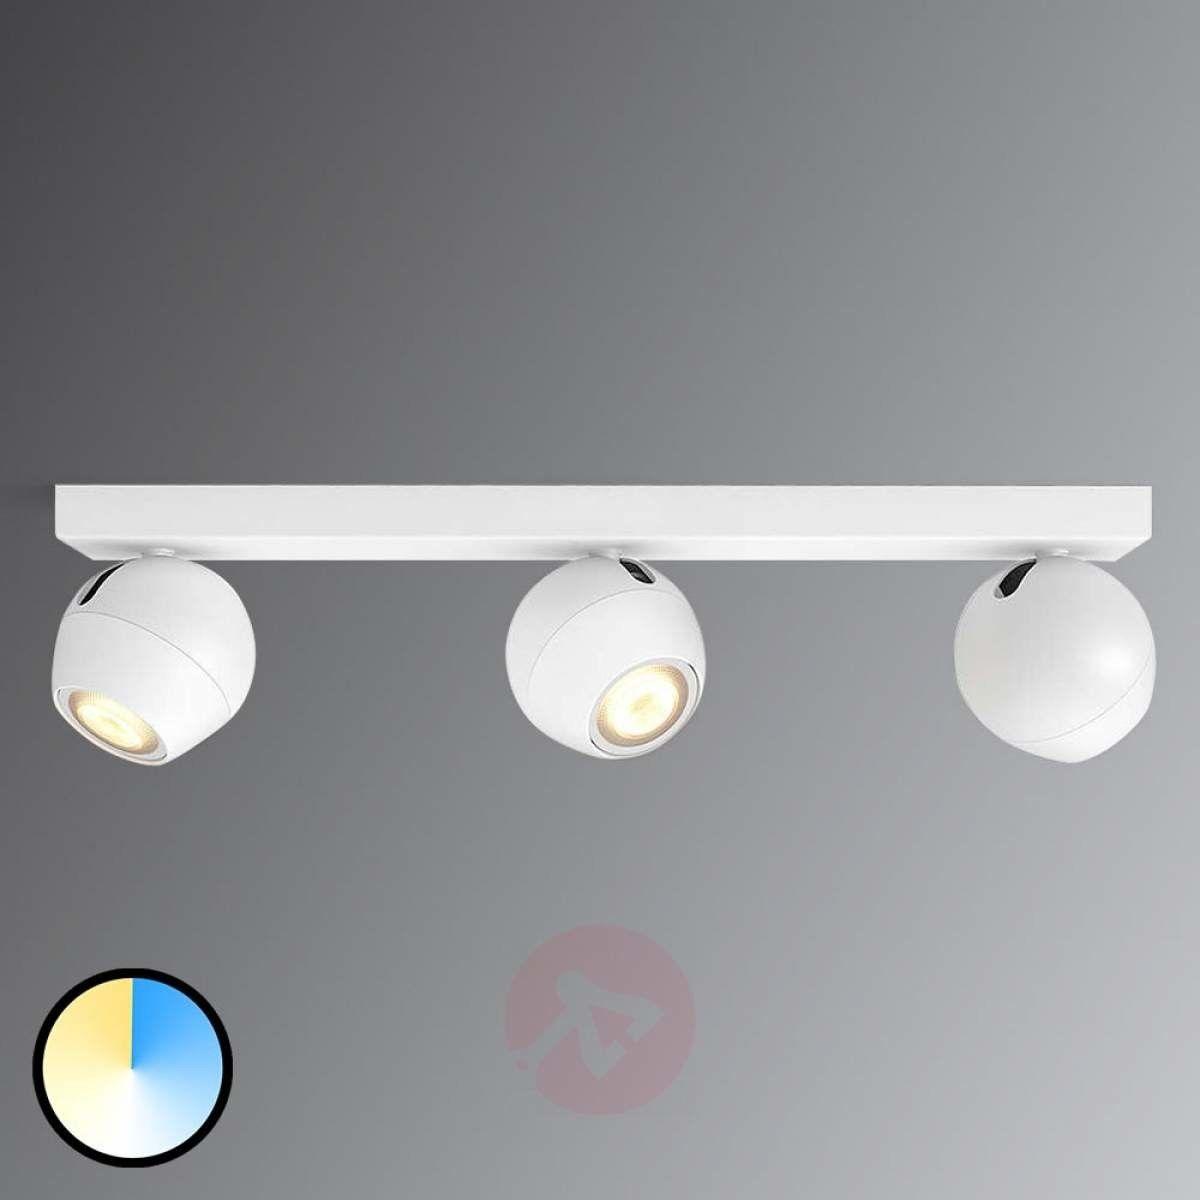 White ambiance Buckram Oświetlenie punktowe 5047331P7 PHILIPS HUE 50473/31/P7